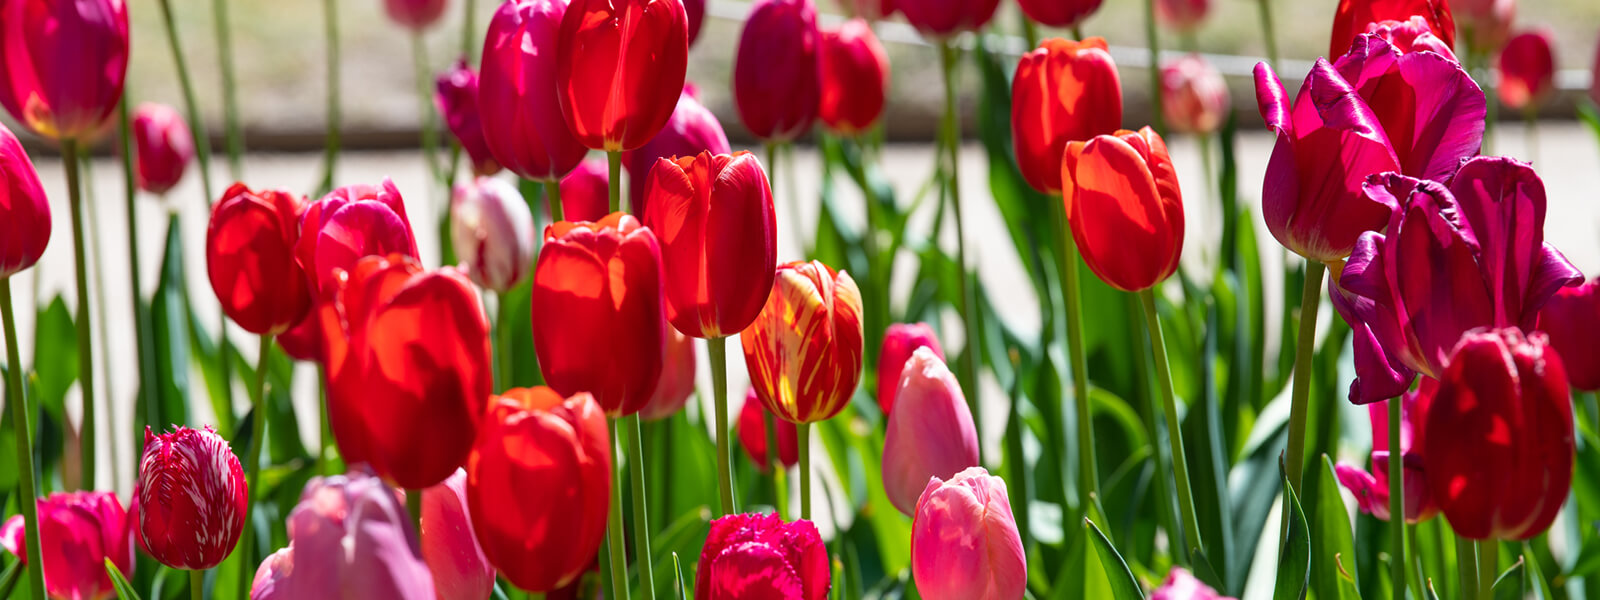 Tulips at Gardenesque